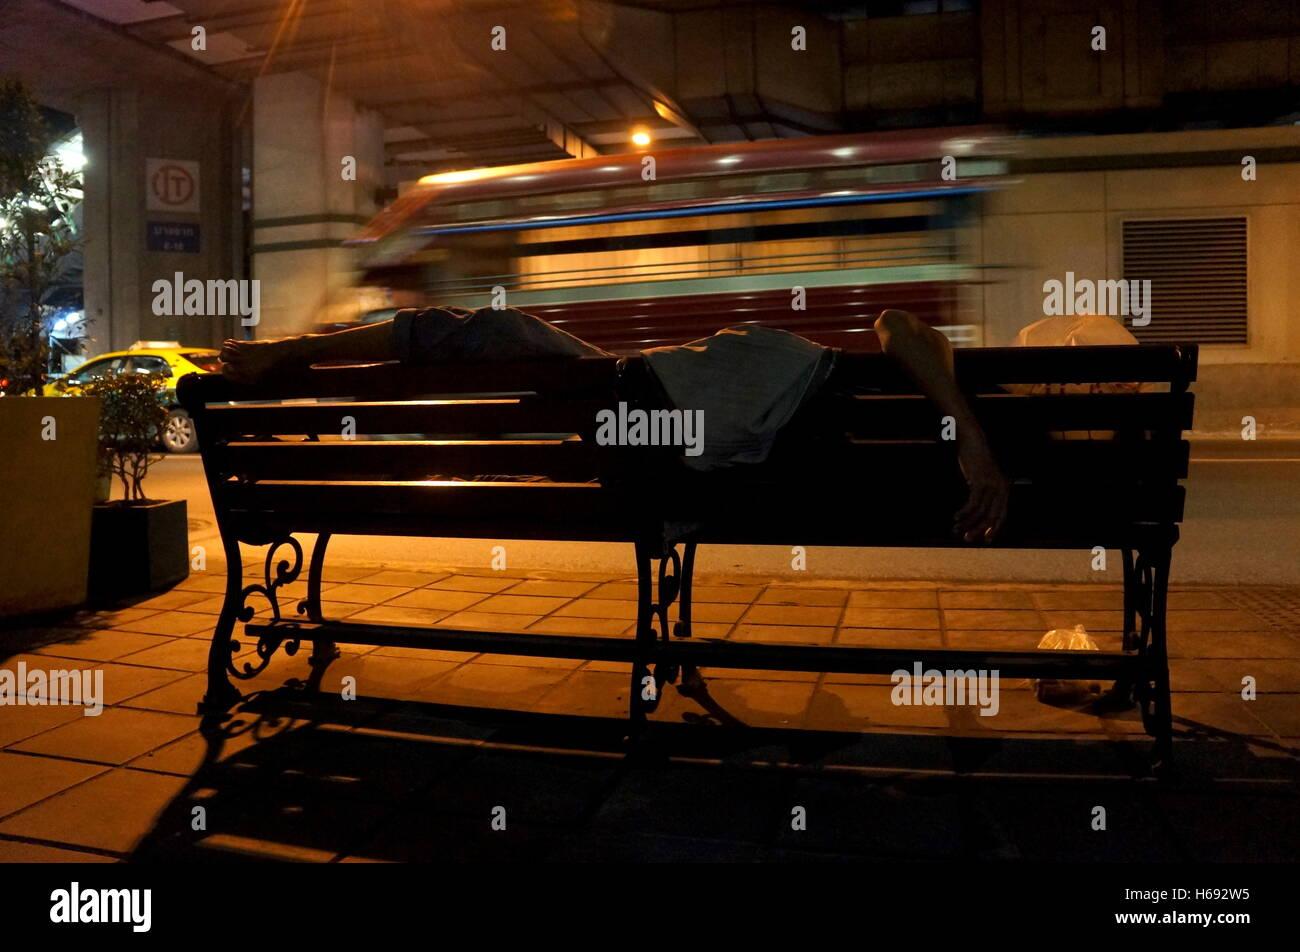 A homeless man sleeps on a bench under the BTS railtracks in Bangkok, Thailand. - Stock Image